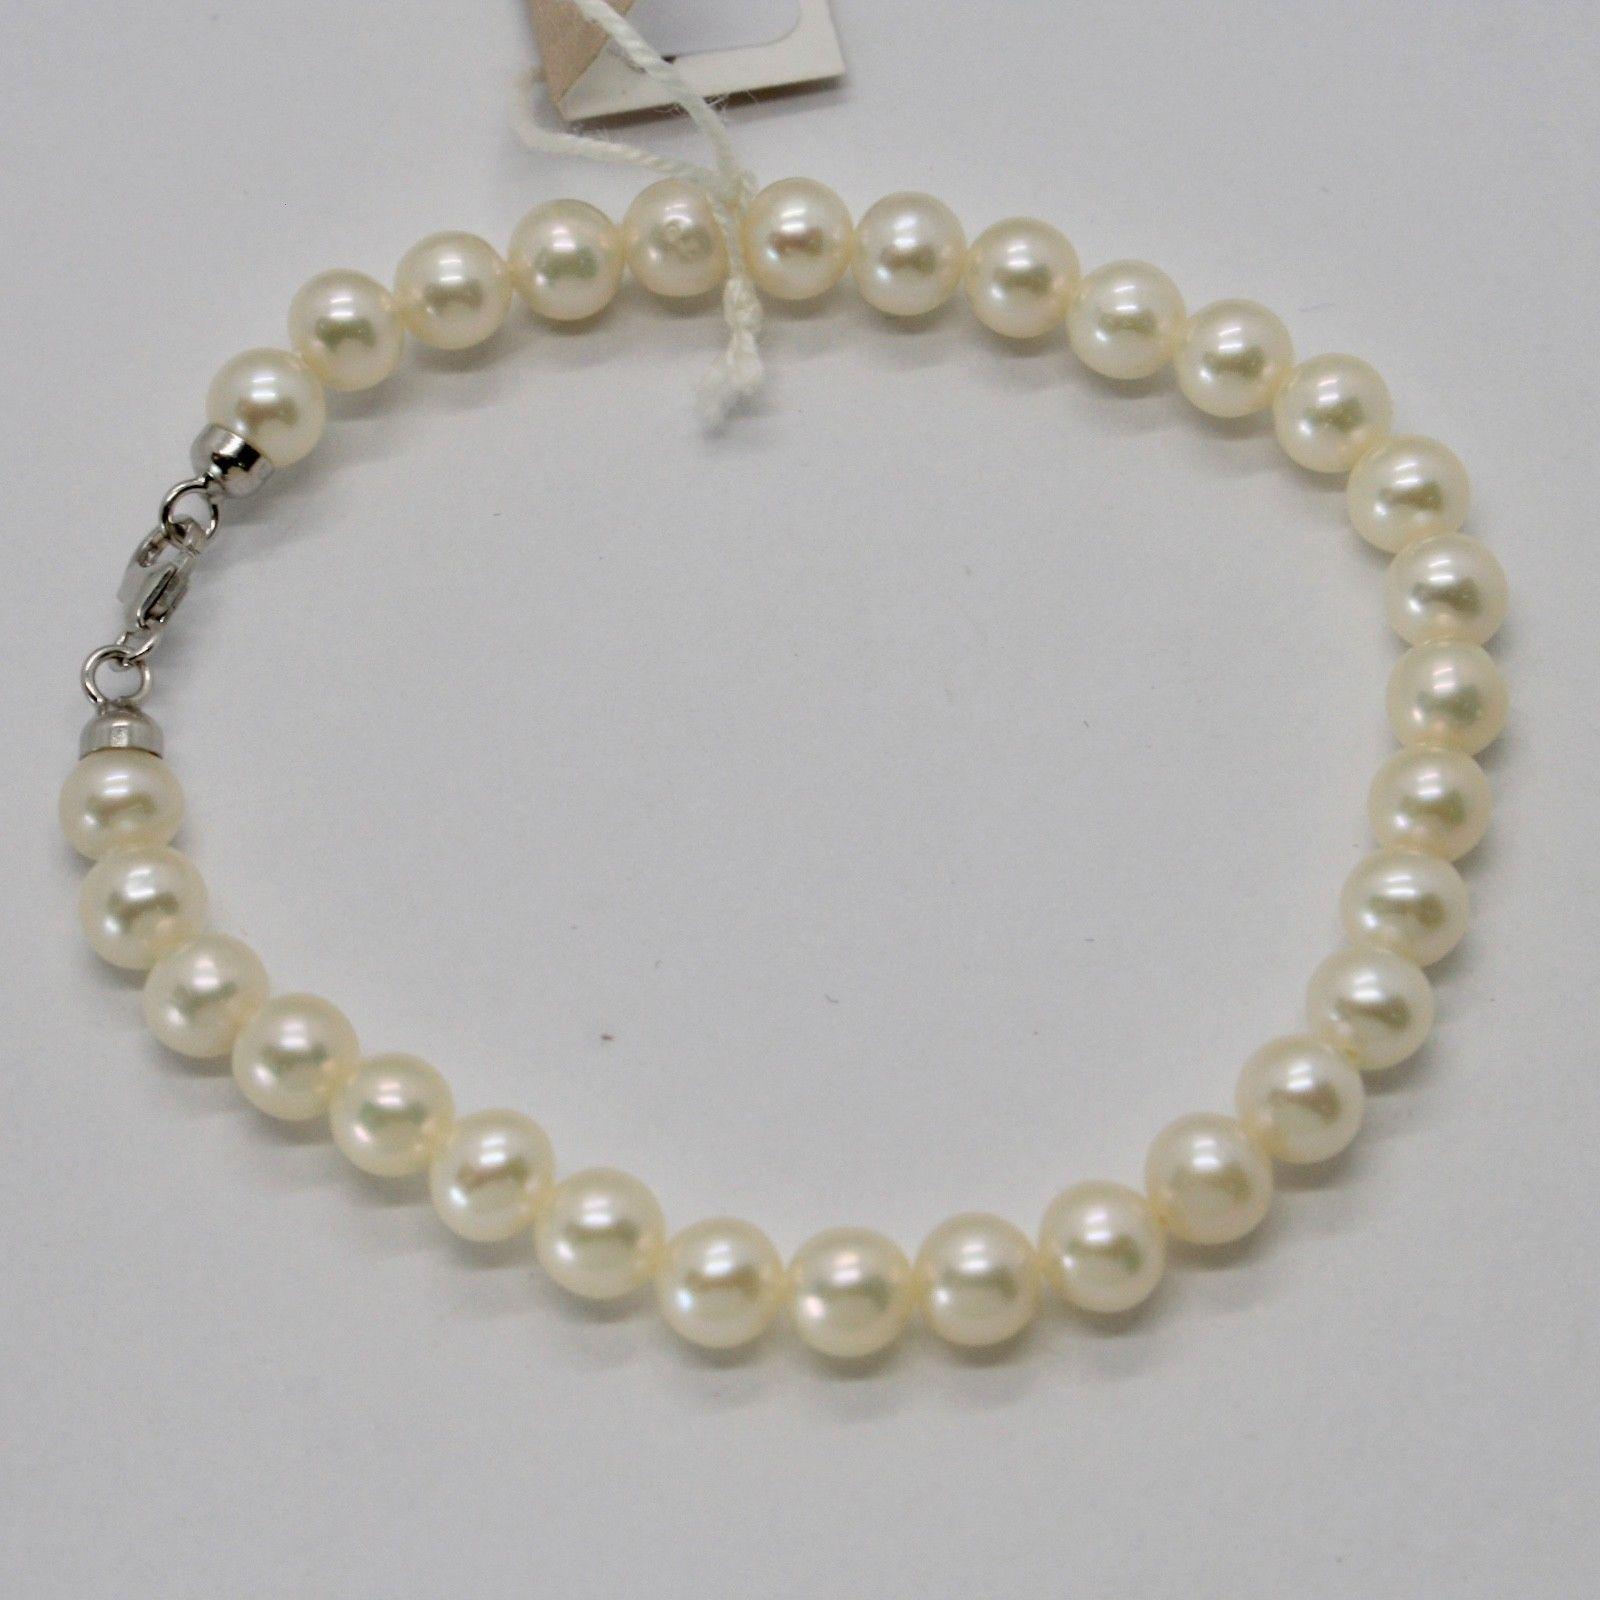 Bracelet en or Blanc 18KT et Argent 925 avec Perles 5.5 6 mm Beau Boîte image 5